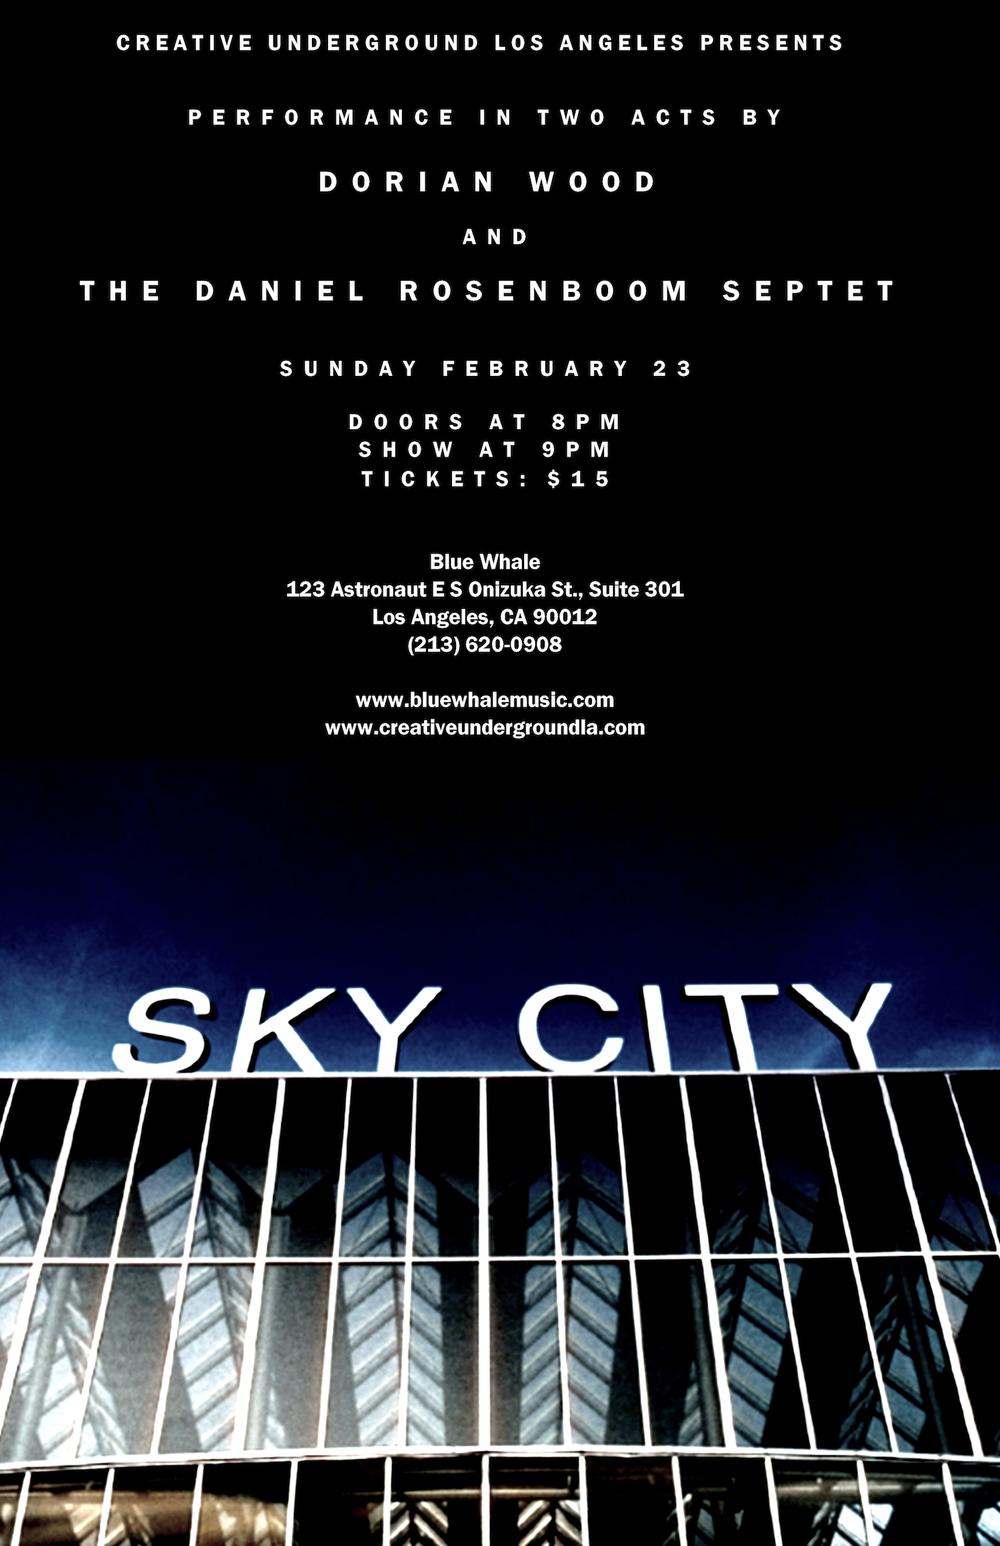 Sky City 2mb.jpg